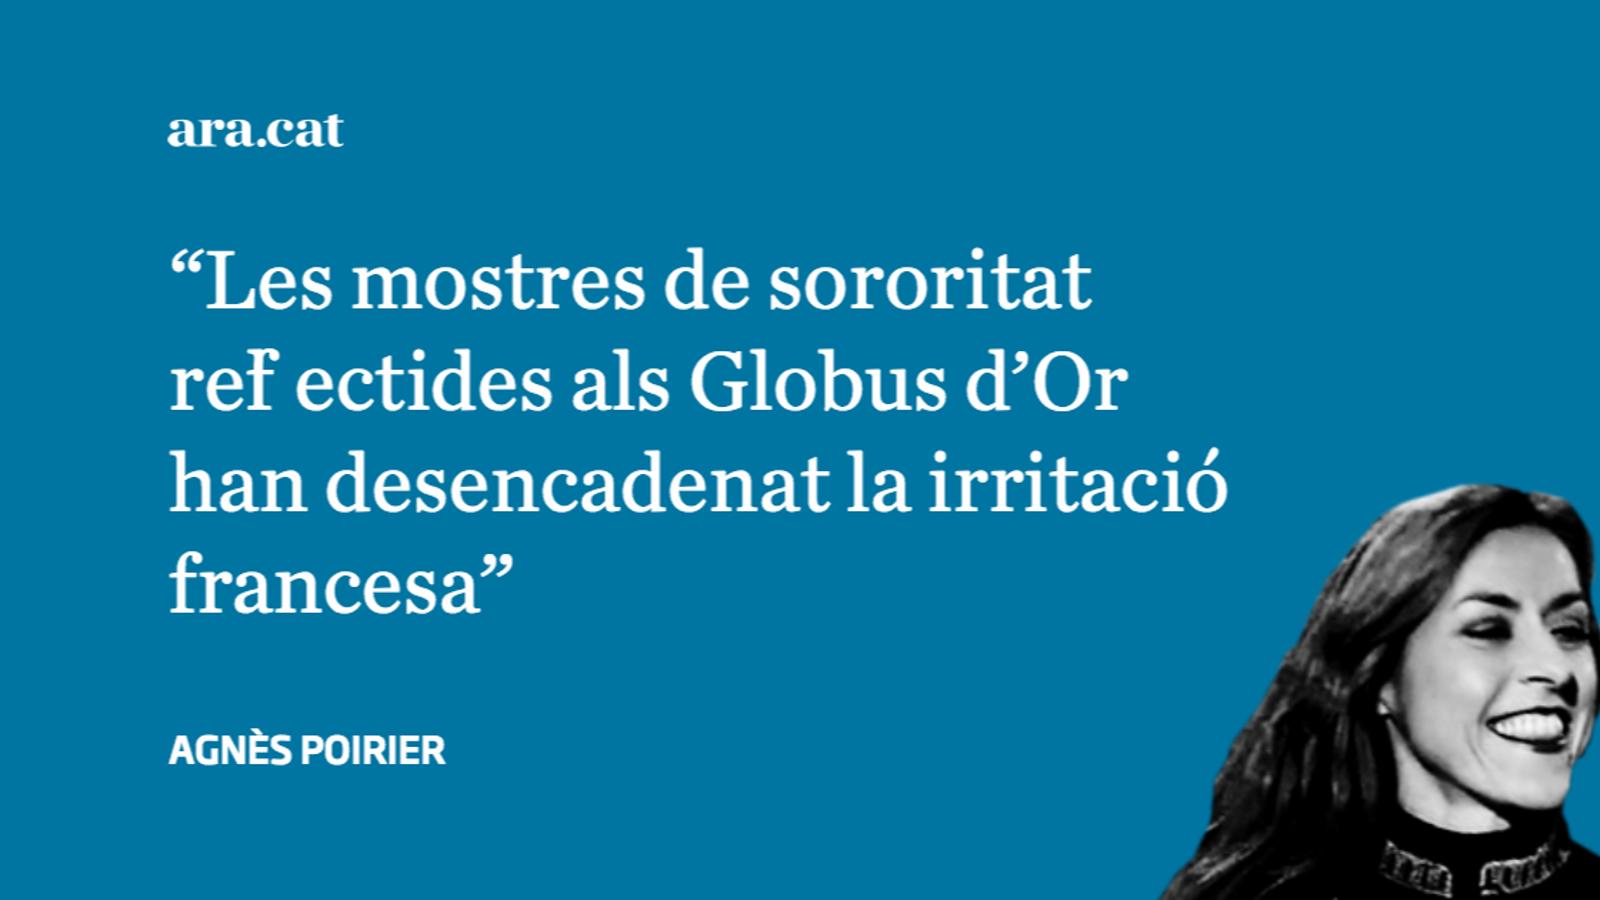 Catherine Deneuve i la diferència  feminista francesa